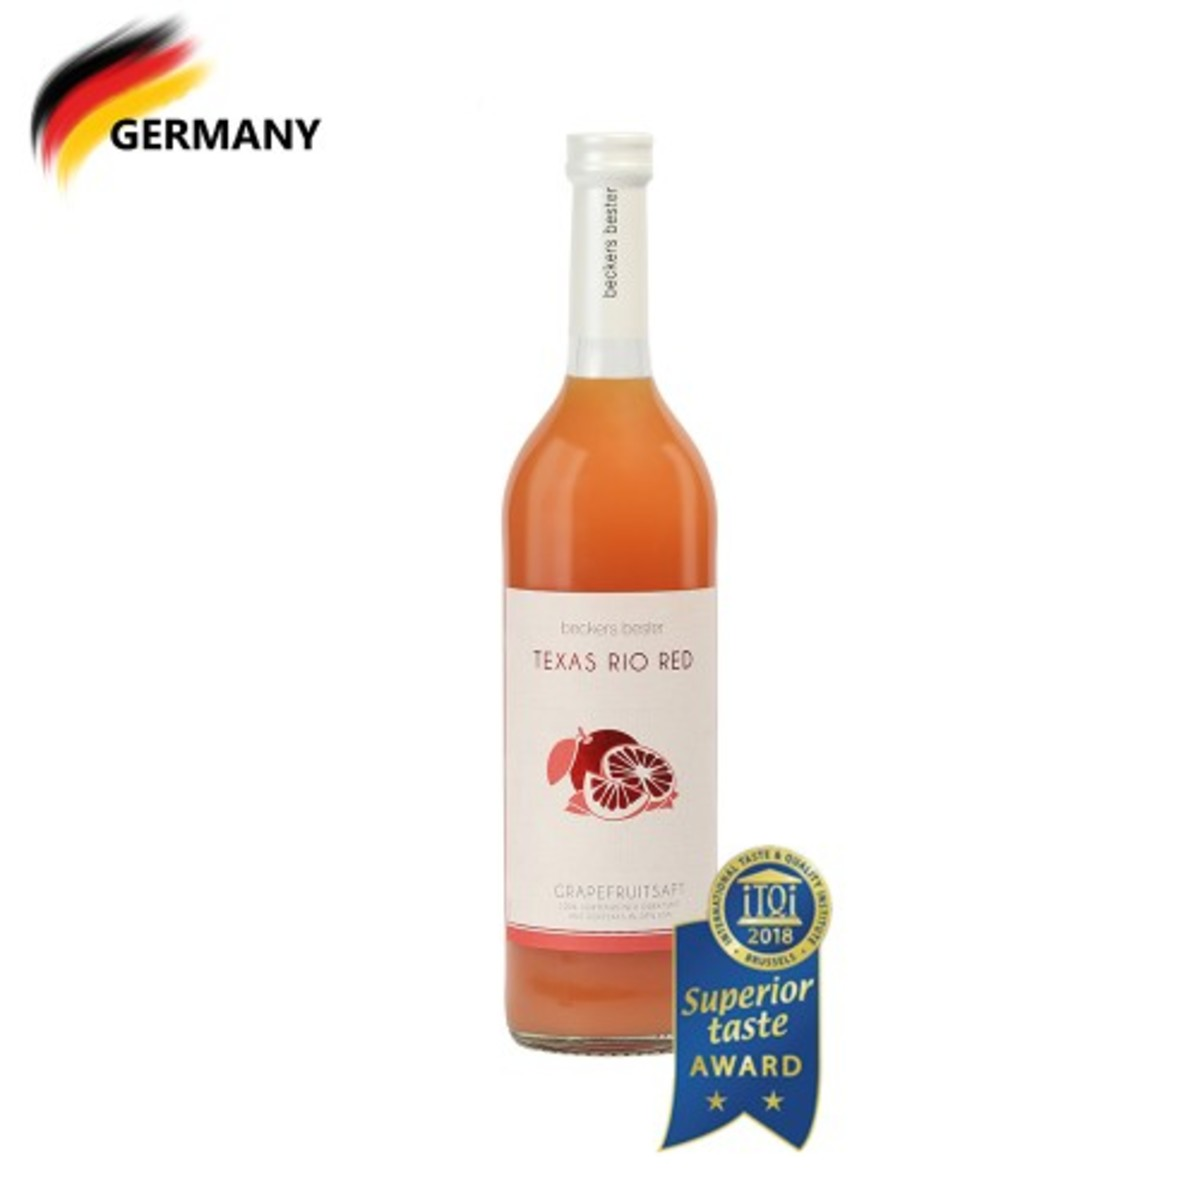 Single Origin Grapefruit Juice - Texas Rio Red (USA - South Texas) 700ml